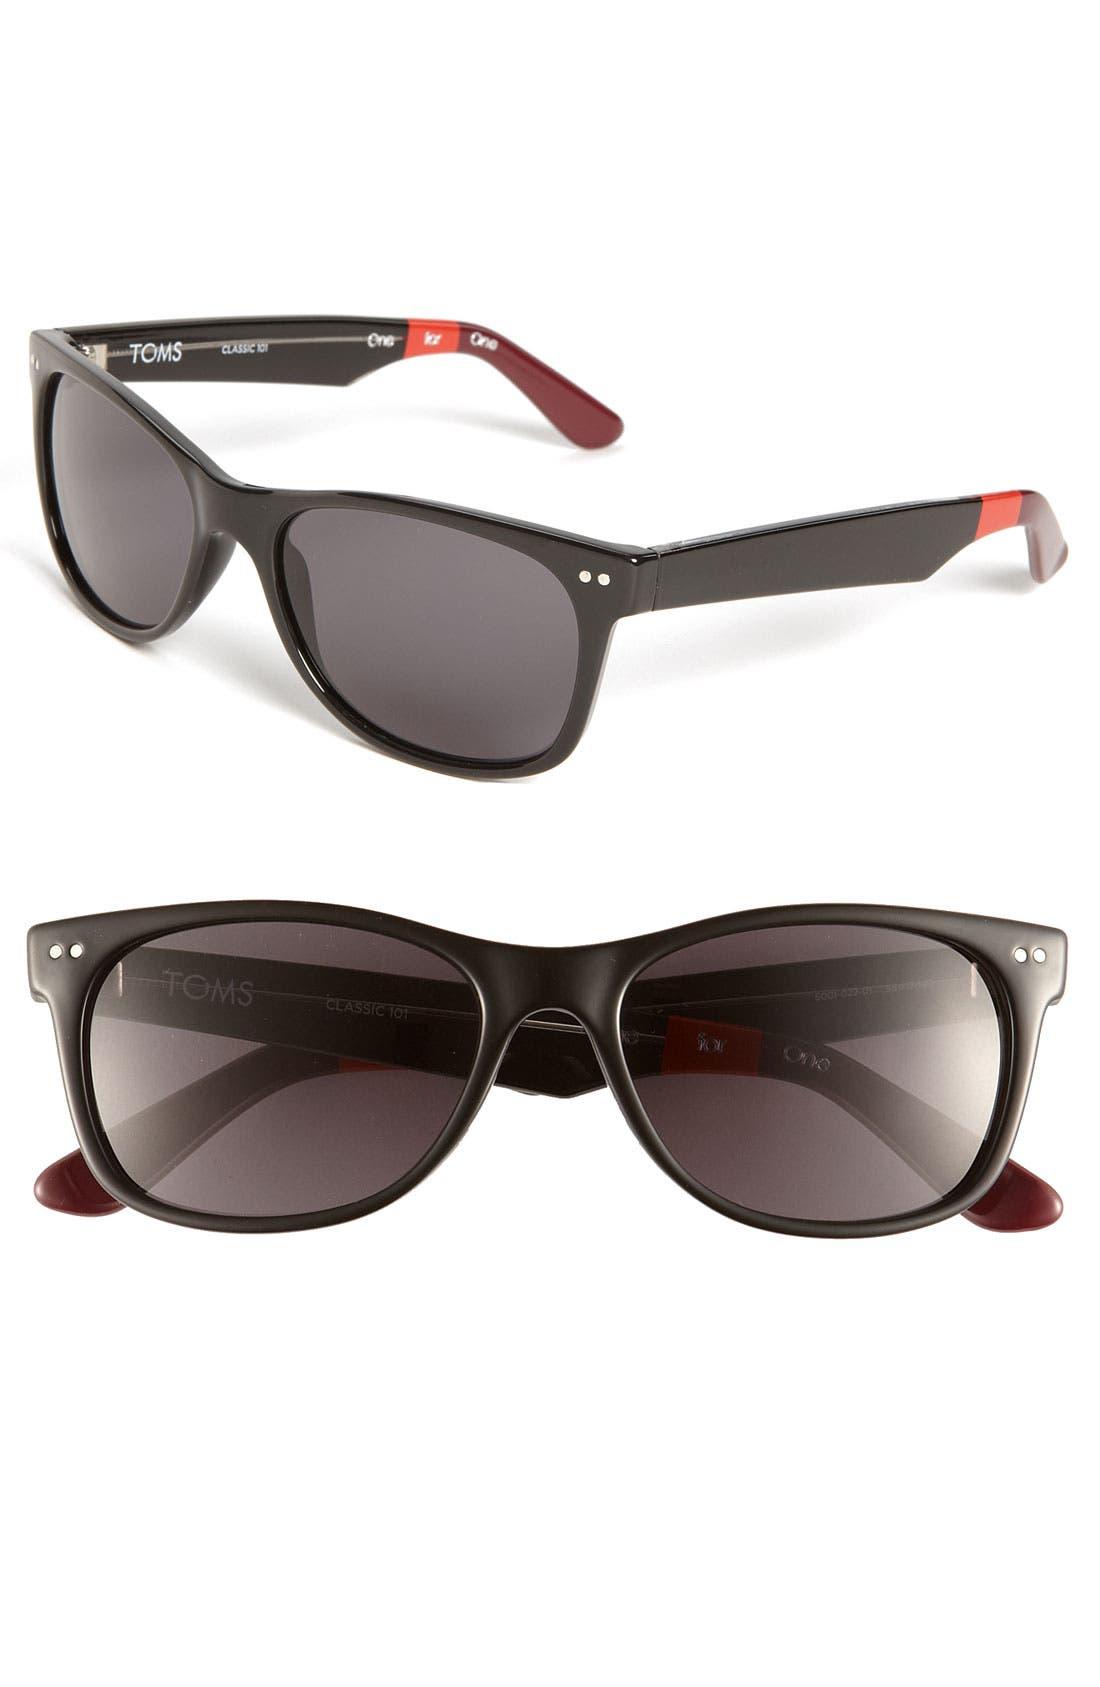 Main Image - TOMS 'Beachmaster' Sunglasses